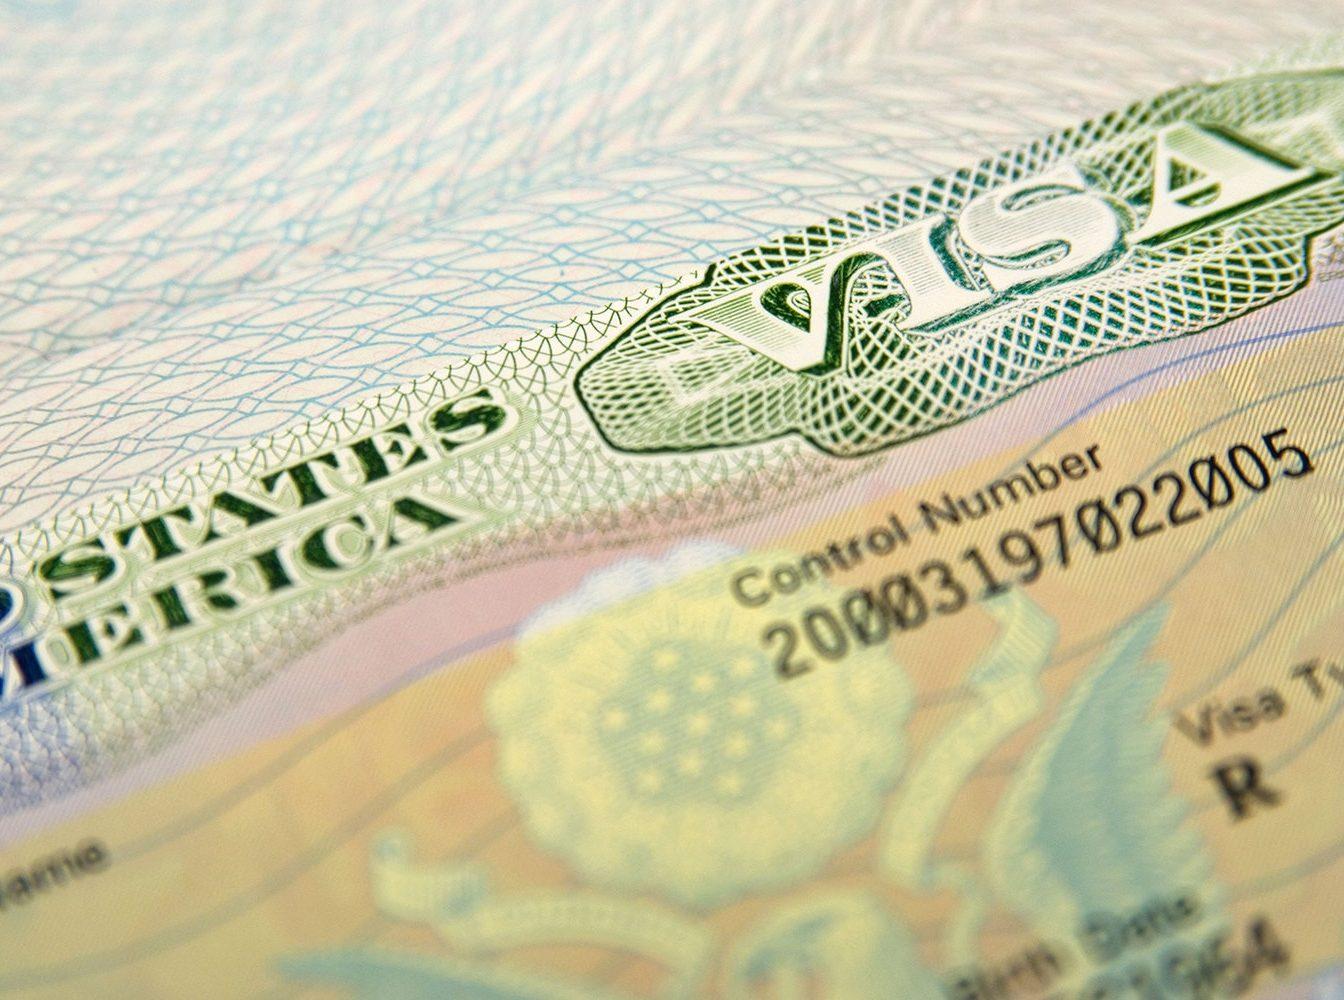 Get U.S. visas in Yerevan